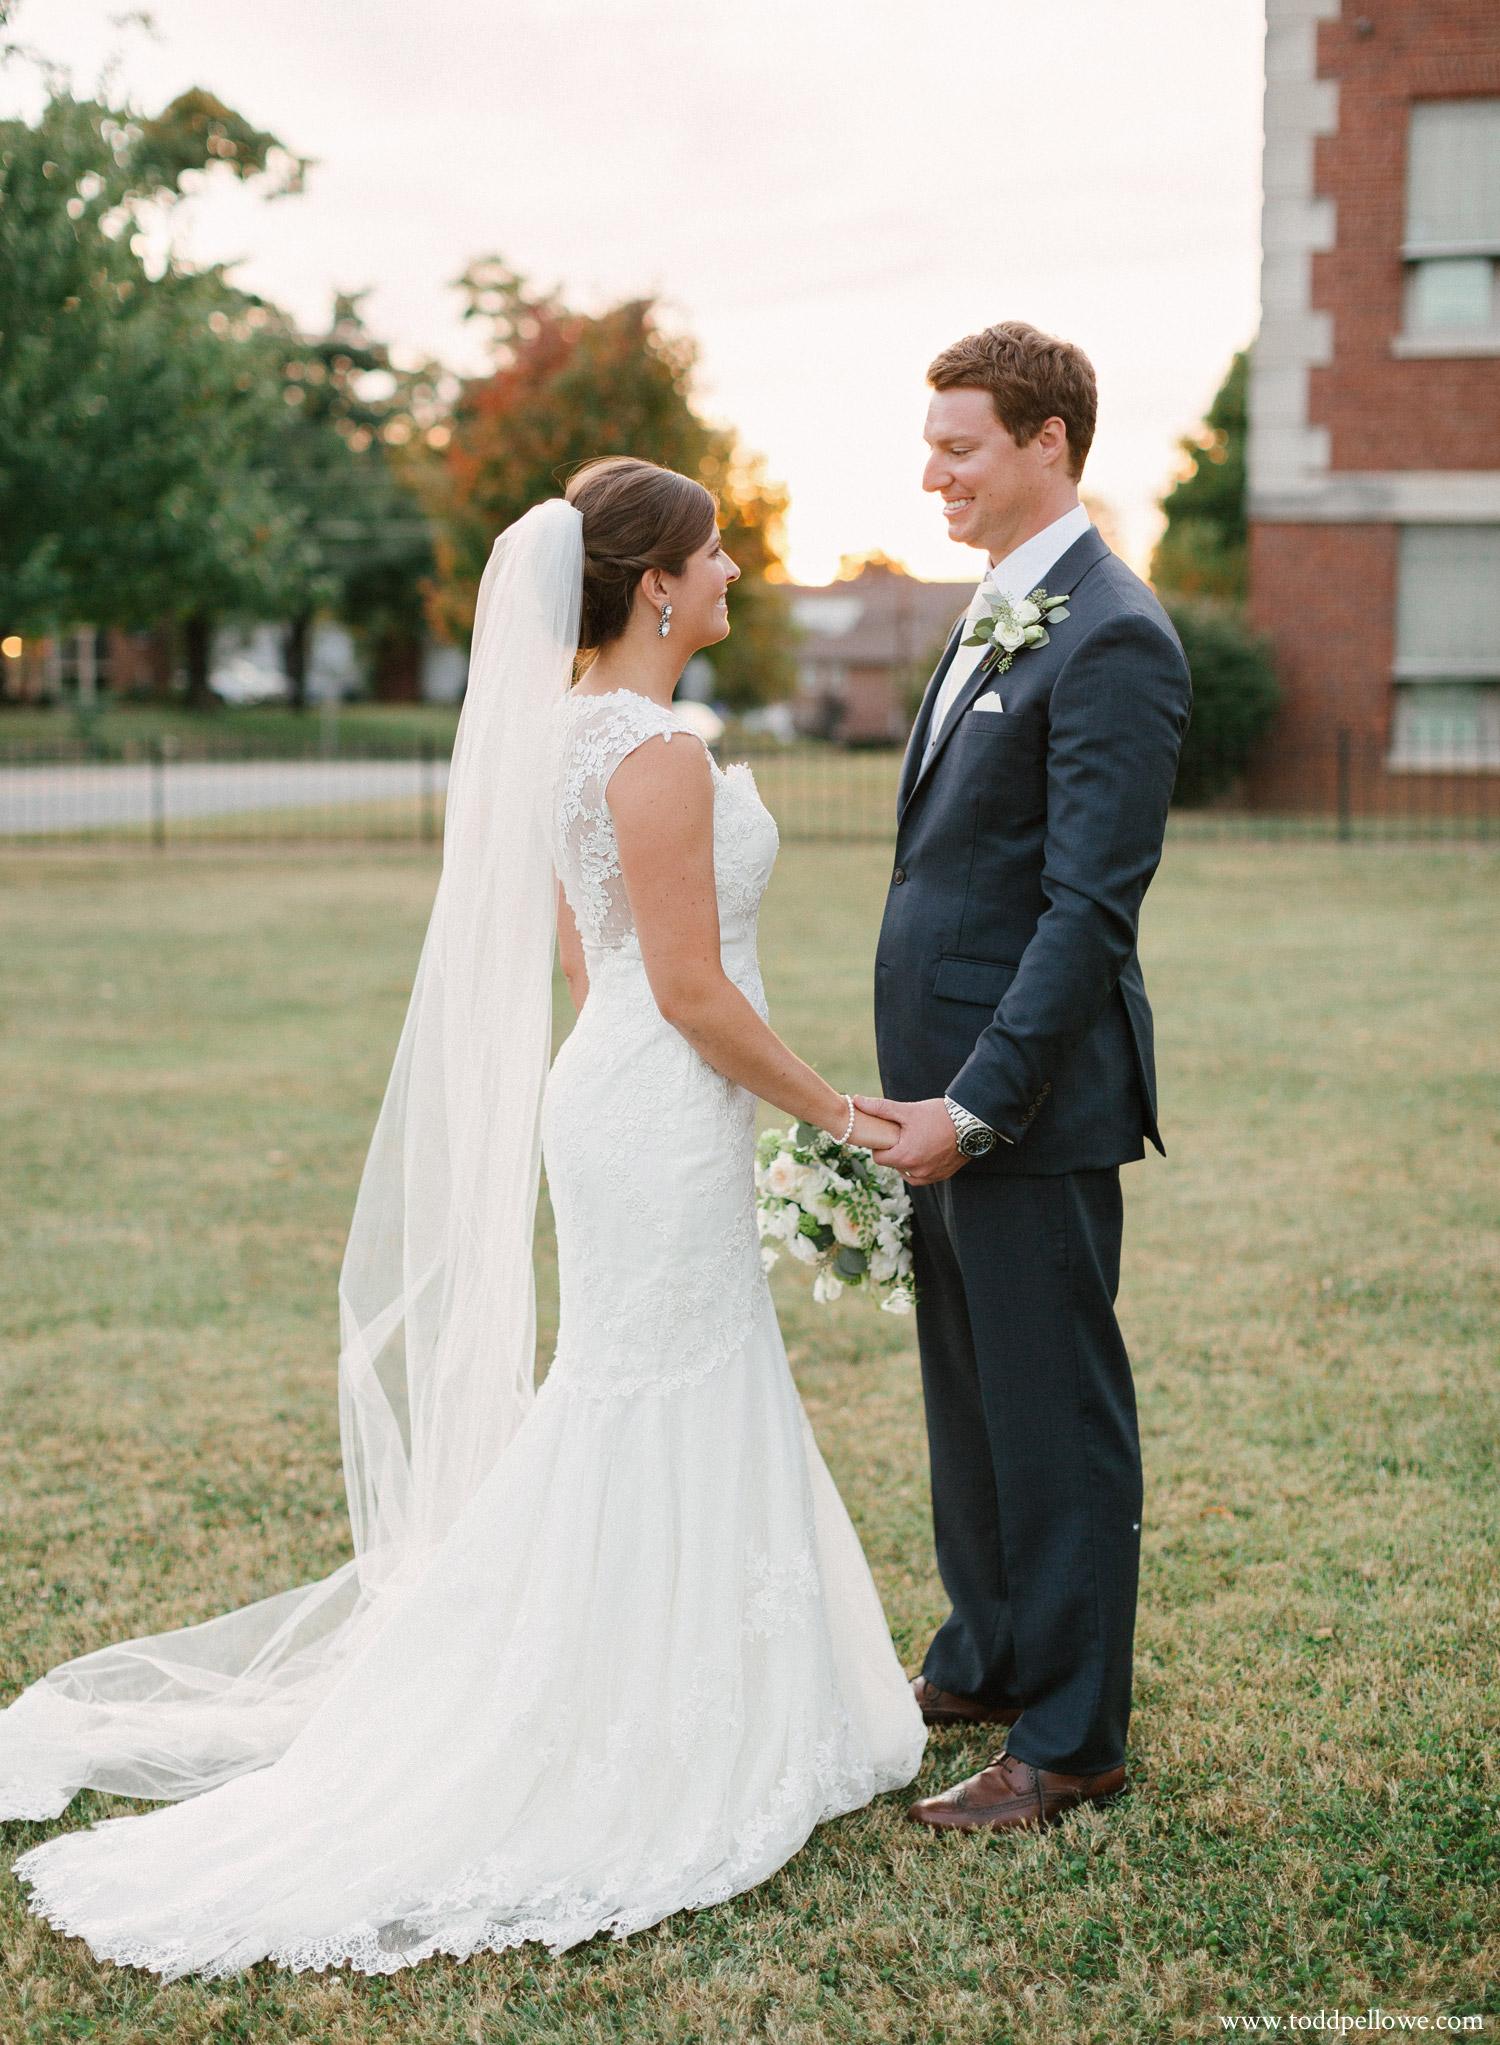 029-bardstown-kentucky-wedding-415.jpg